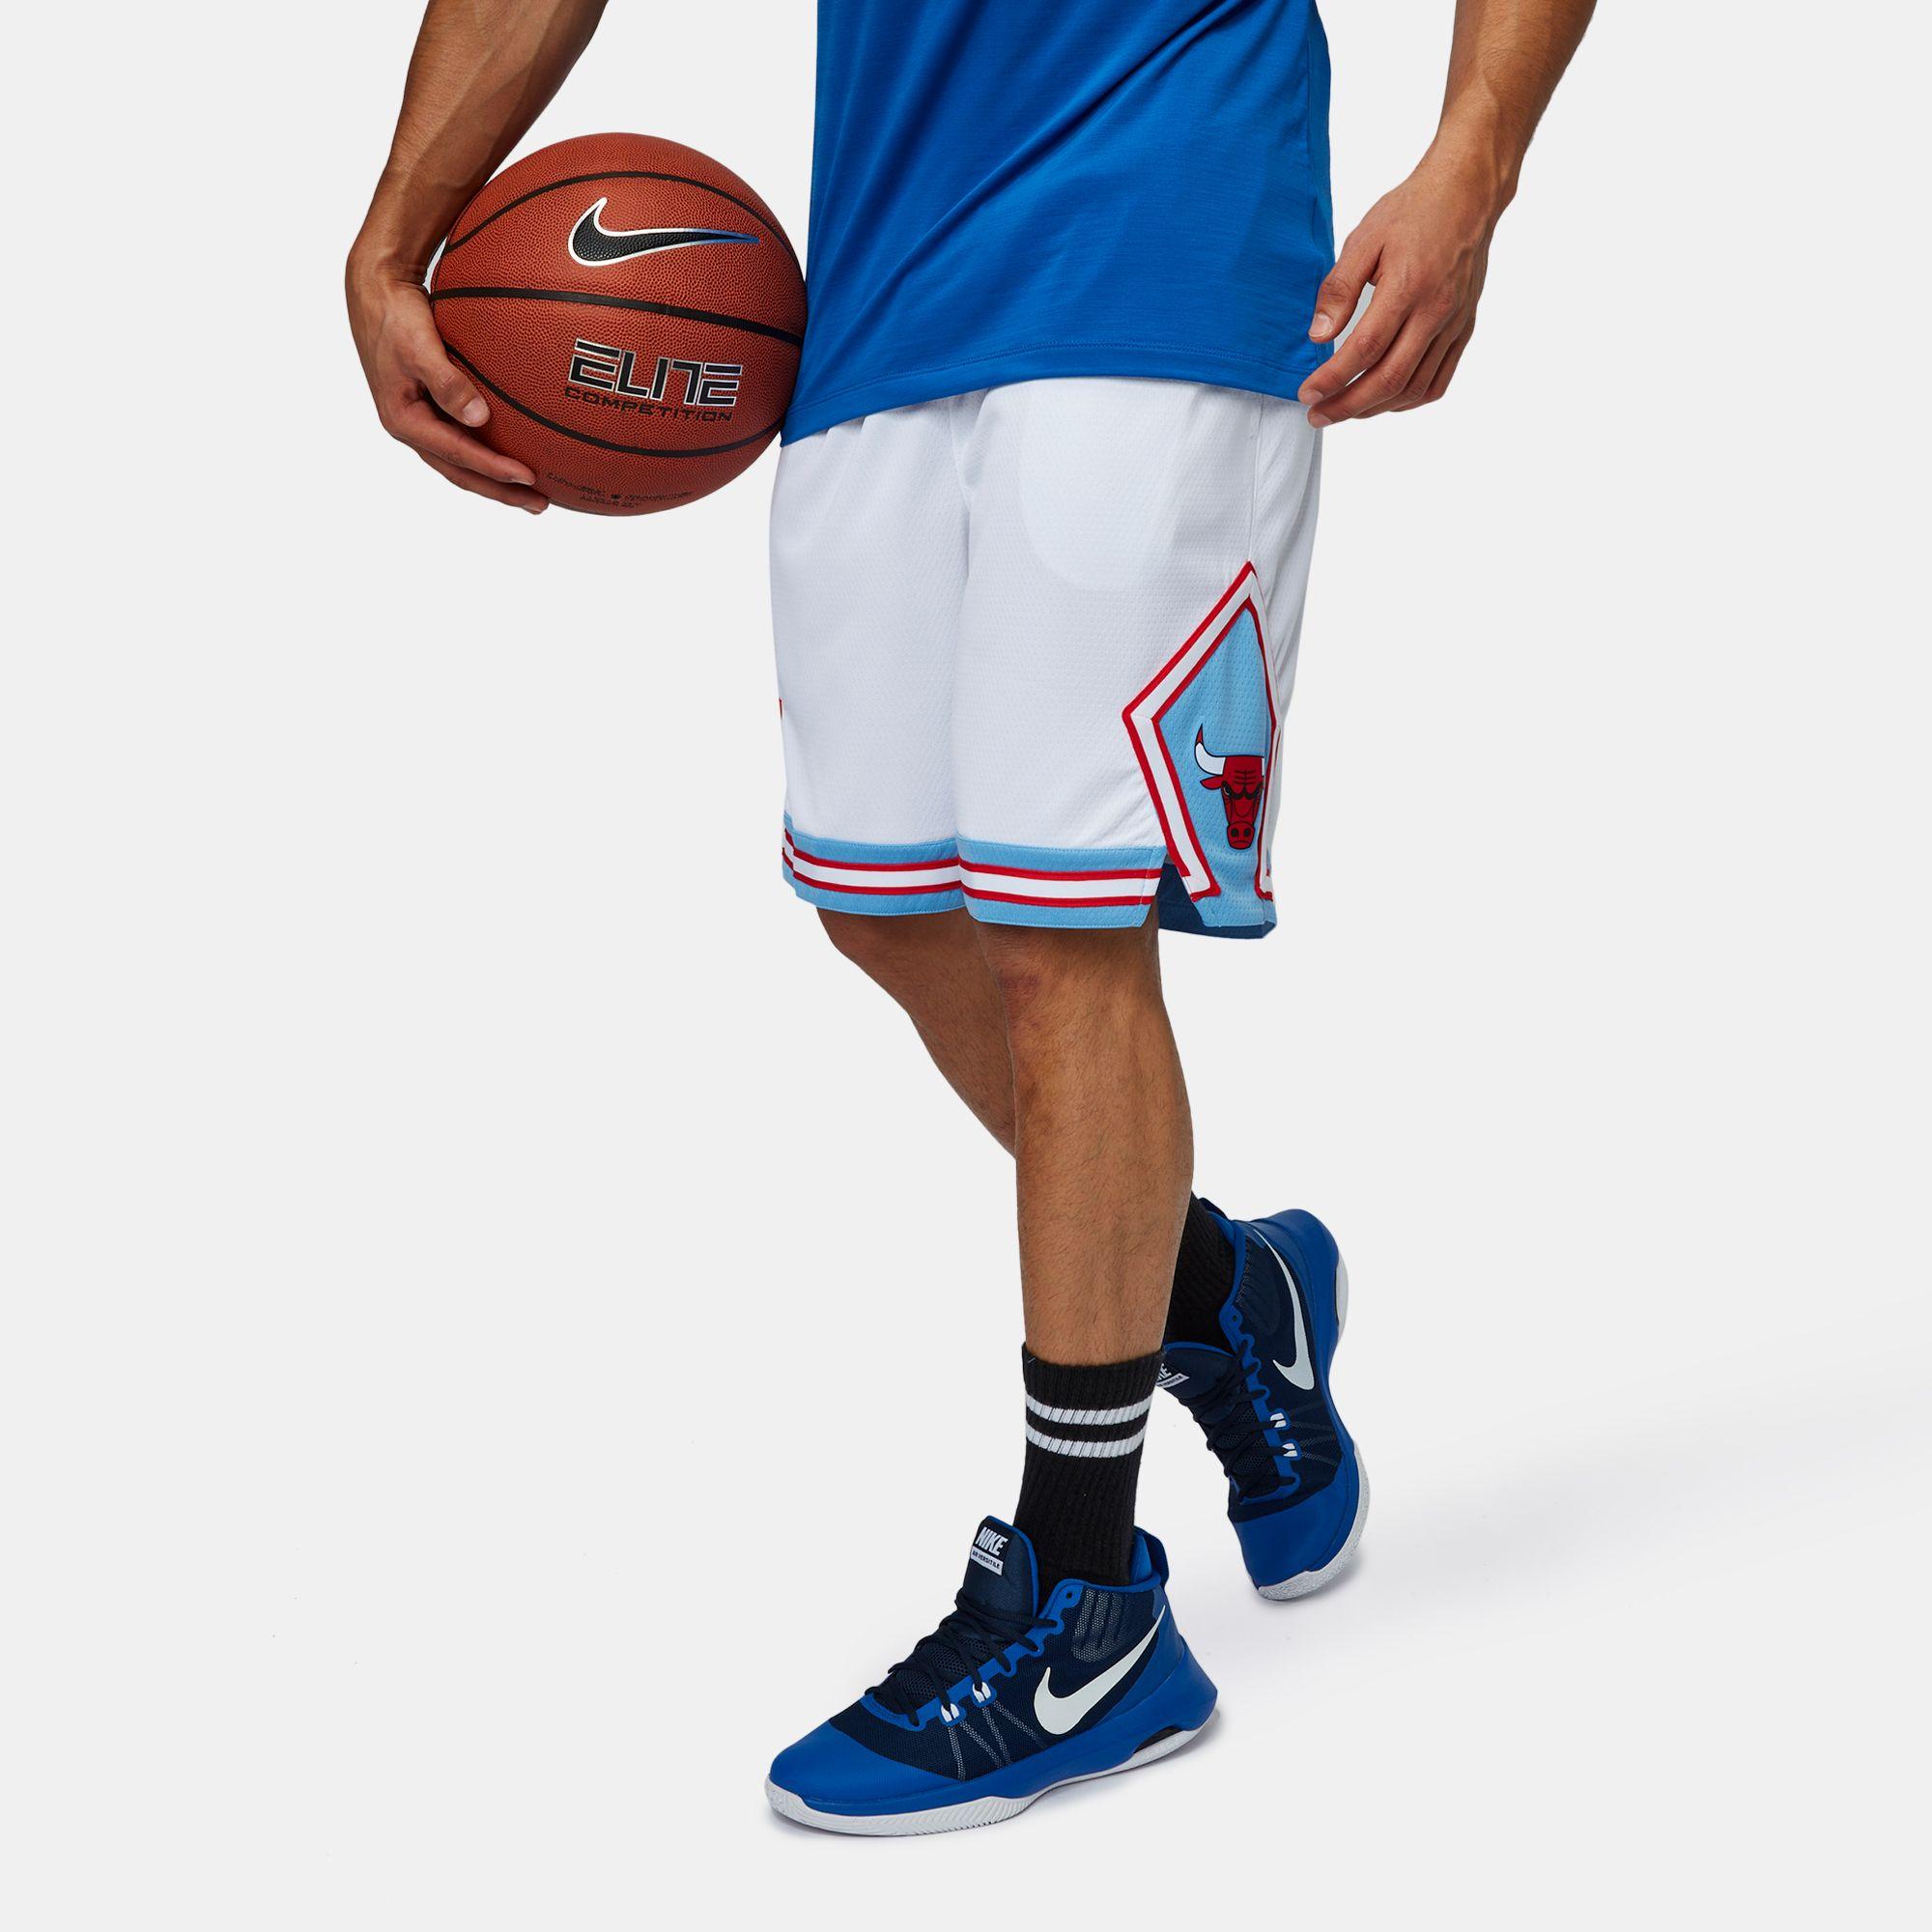 huge selection of 74618 a1109 Nike NBA Chicago Bulls Swingman City Edition Basketball Shorts ...